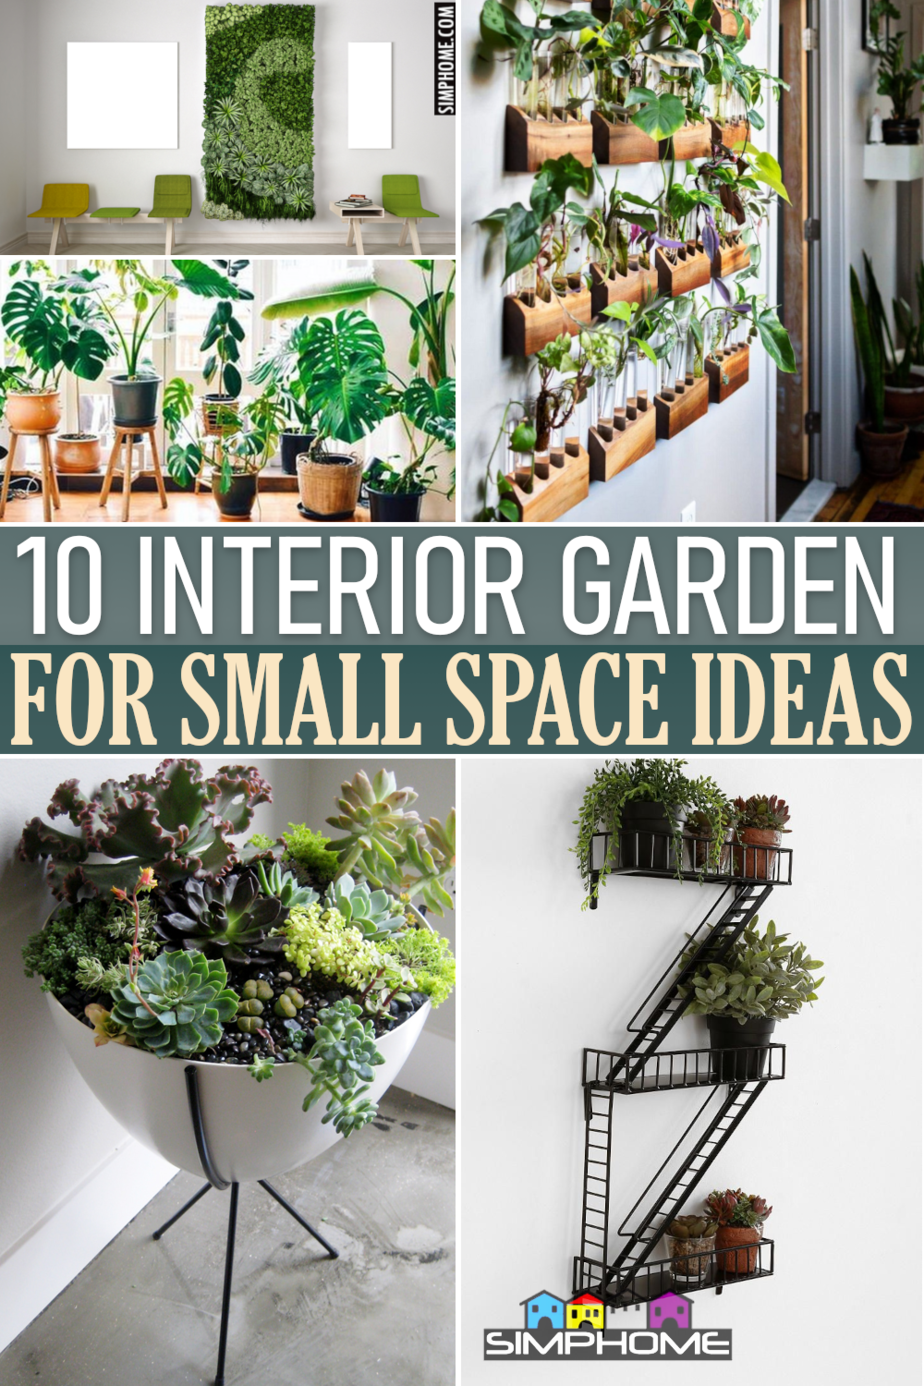 10 Interior Garden Ideas for Small Property Featured Image via SIMPHOME.COMThumbnail